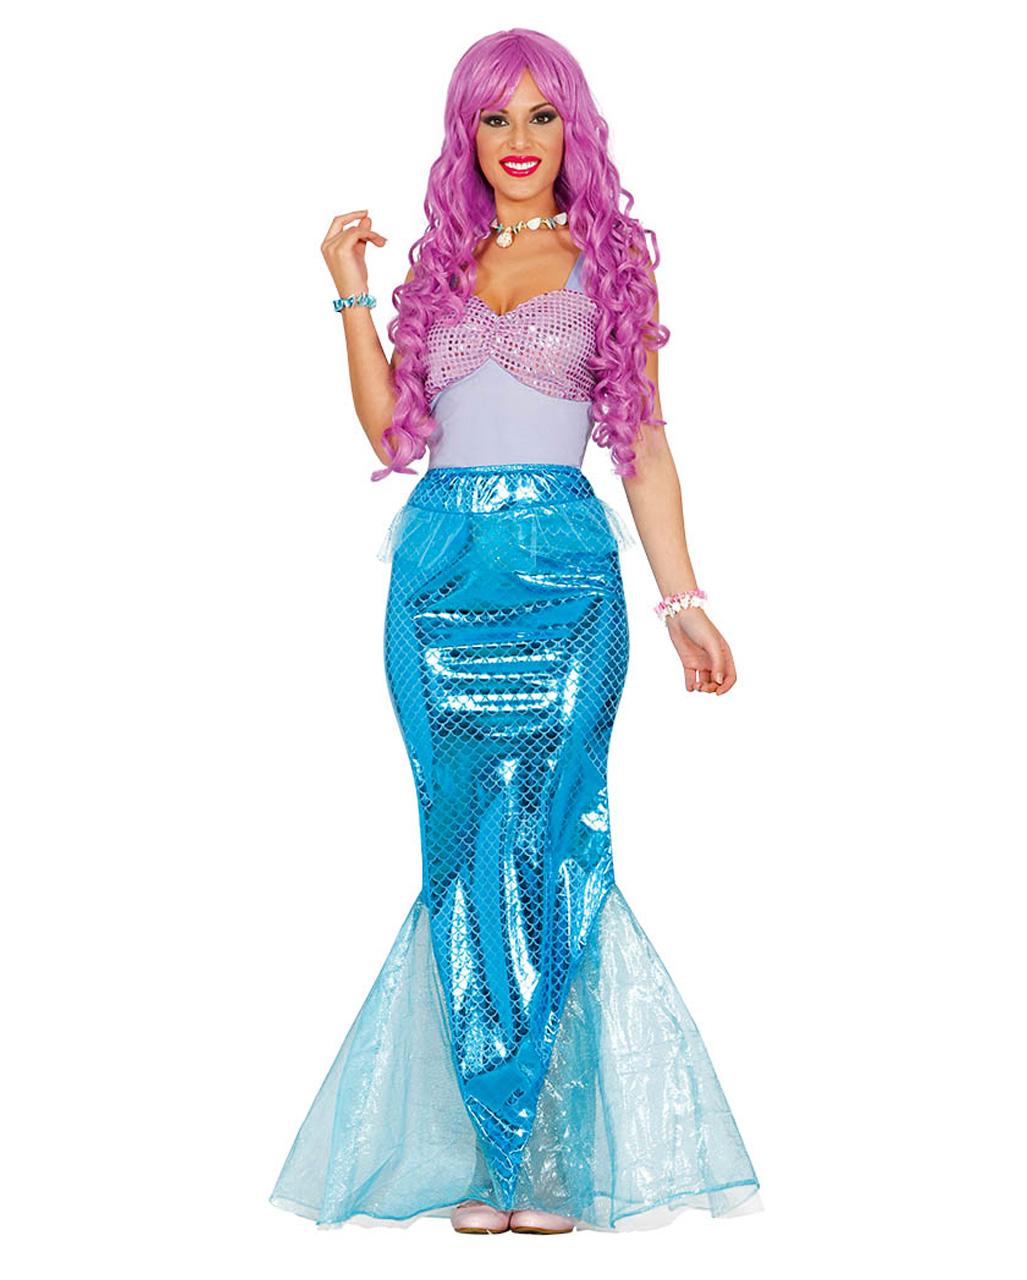 Sirena Mermaid Costume buy now!   horror-shop.com